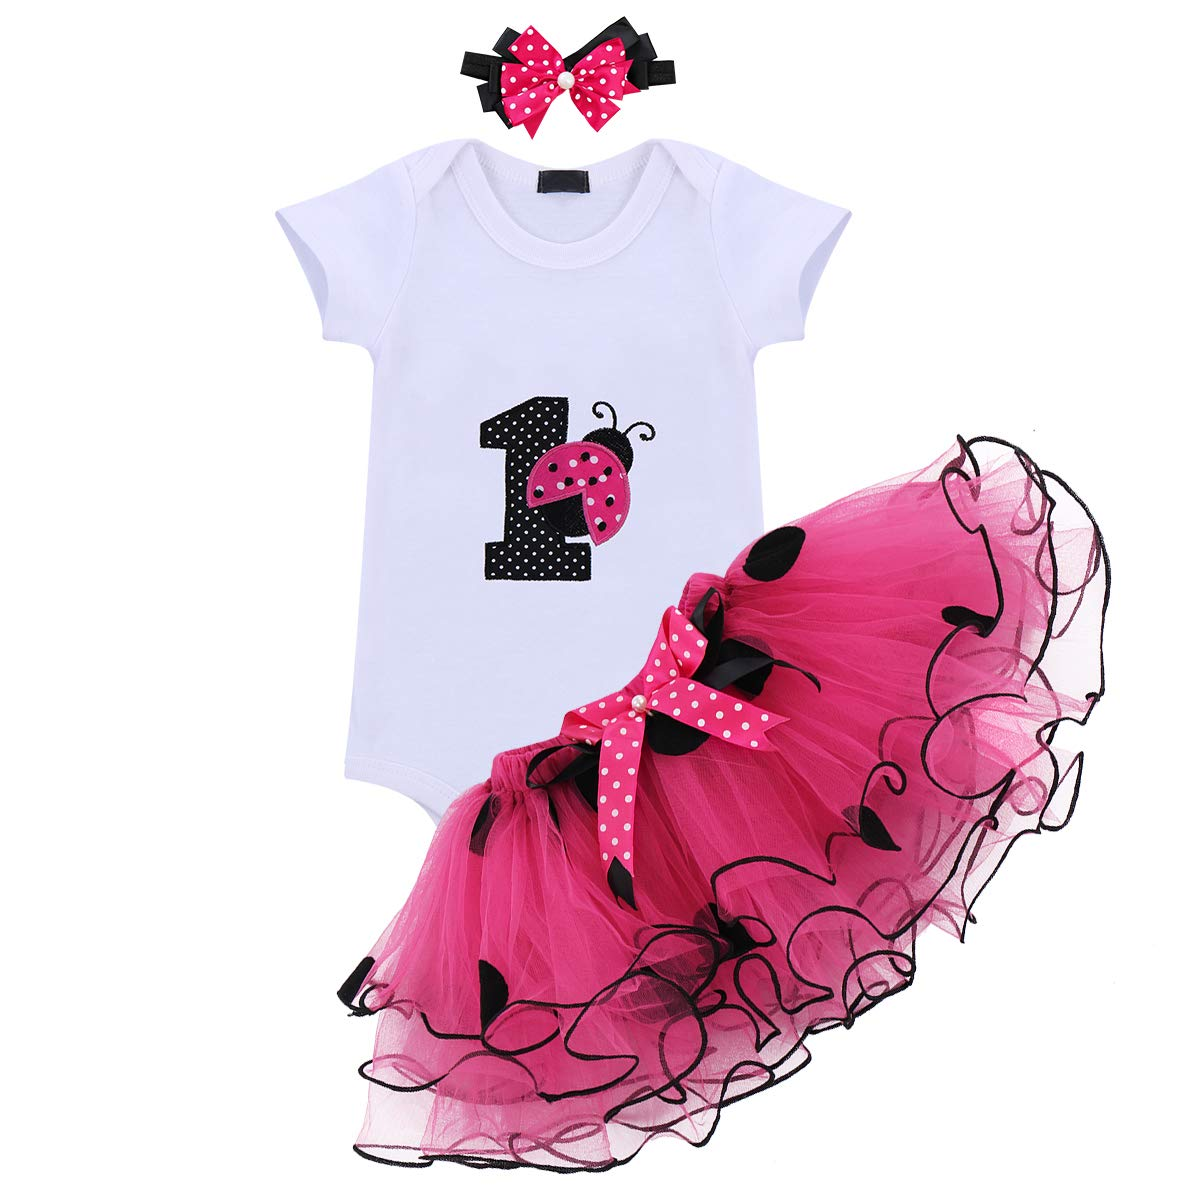 dd00c8dfdb2f Amazon.com: Baby Girls 3PCS Ladybug One Polka Dots 1st Birthday Outfit  Romper with Tutu Skirt and Headband Set Hot Pink: Clothing